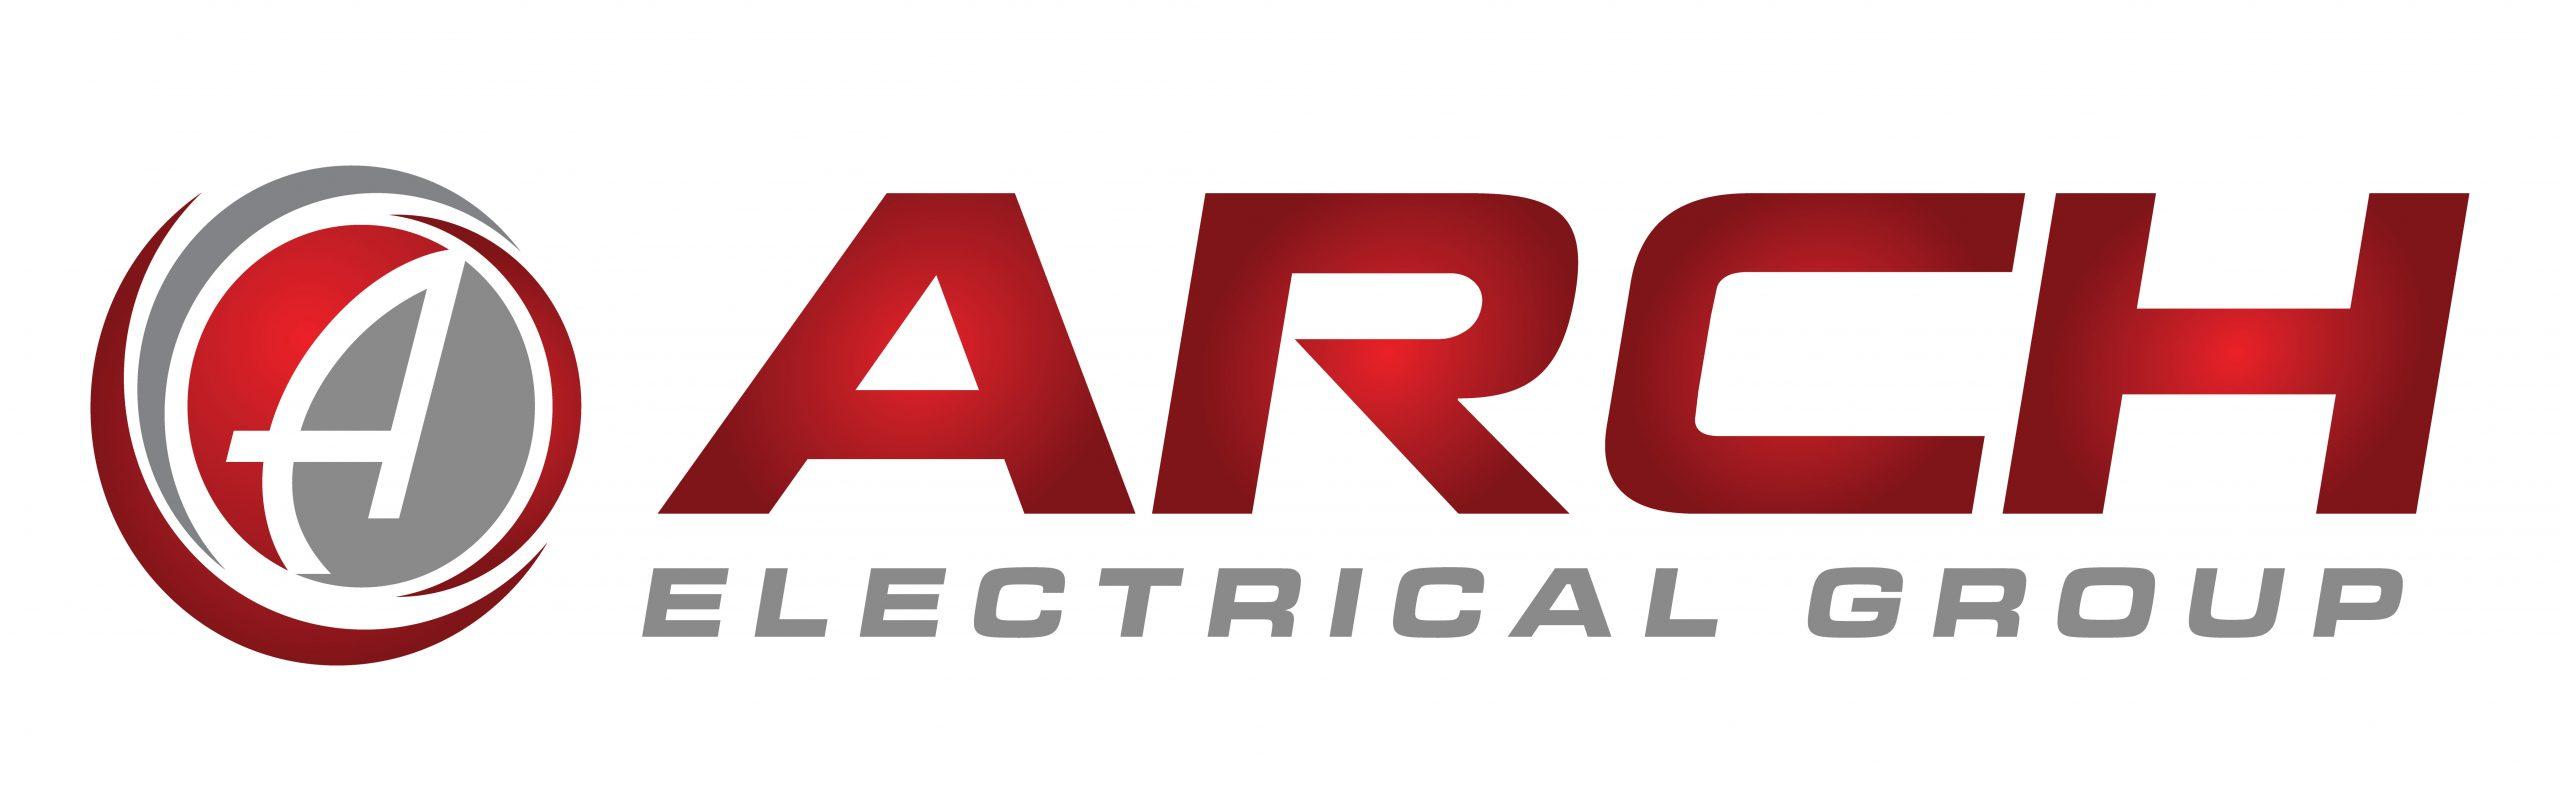 ARCH-website-logo (1)